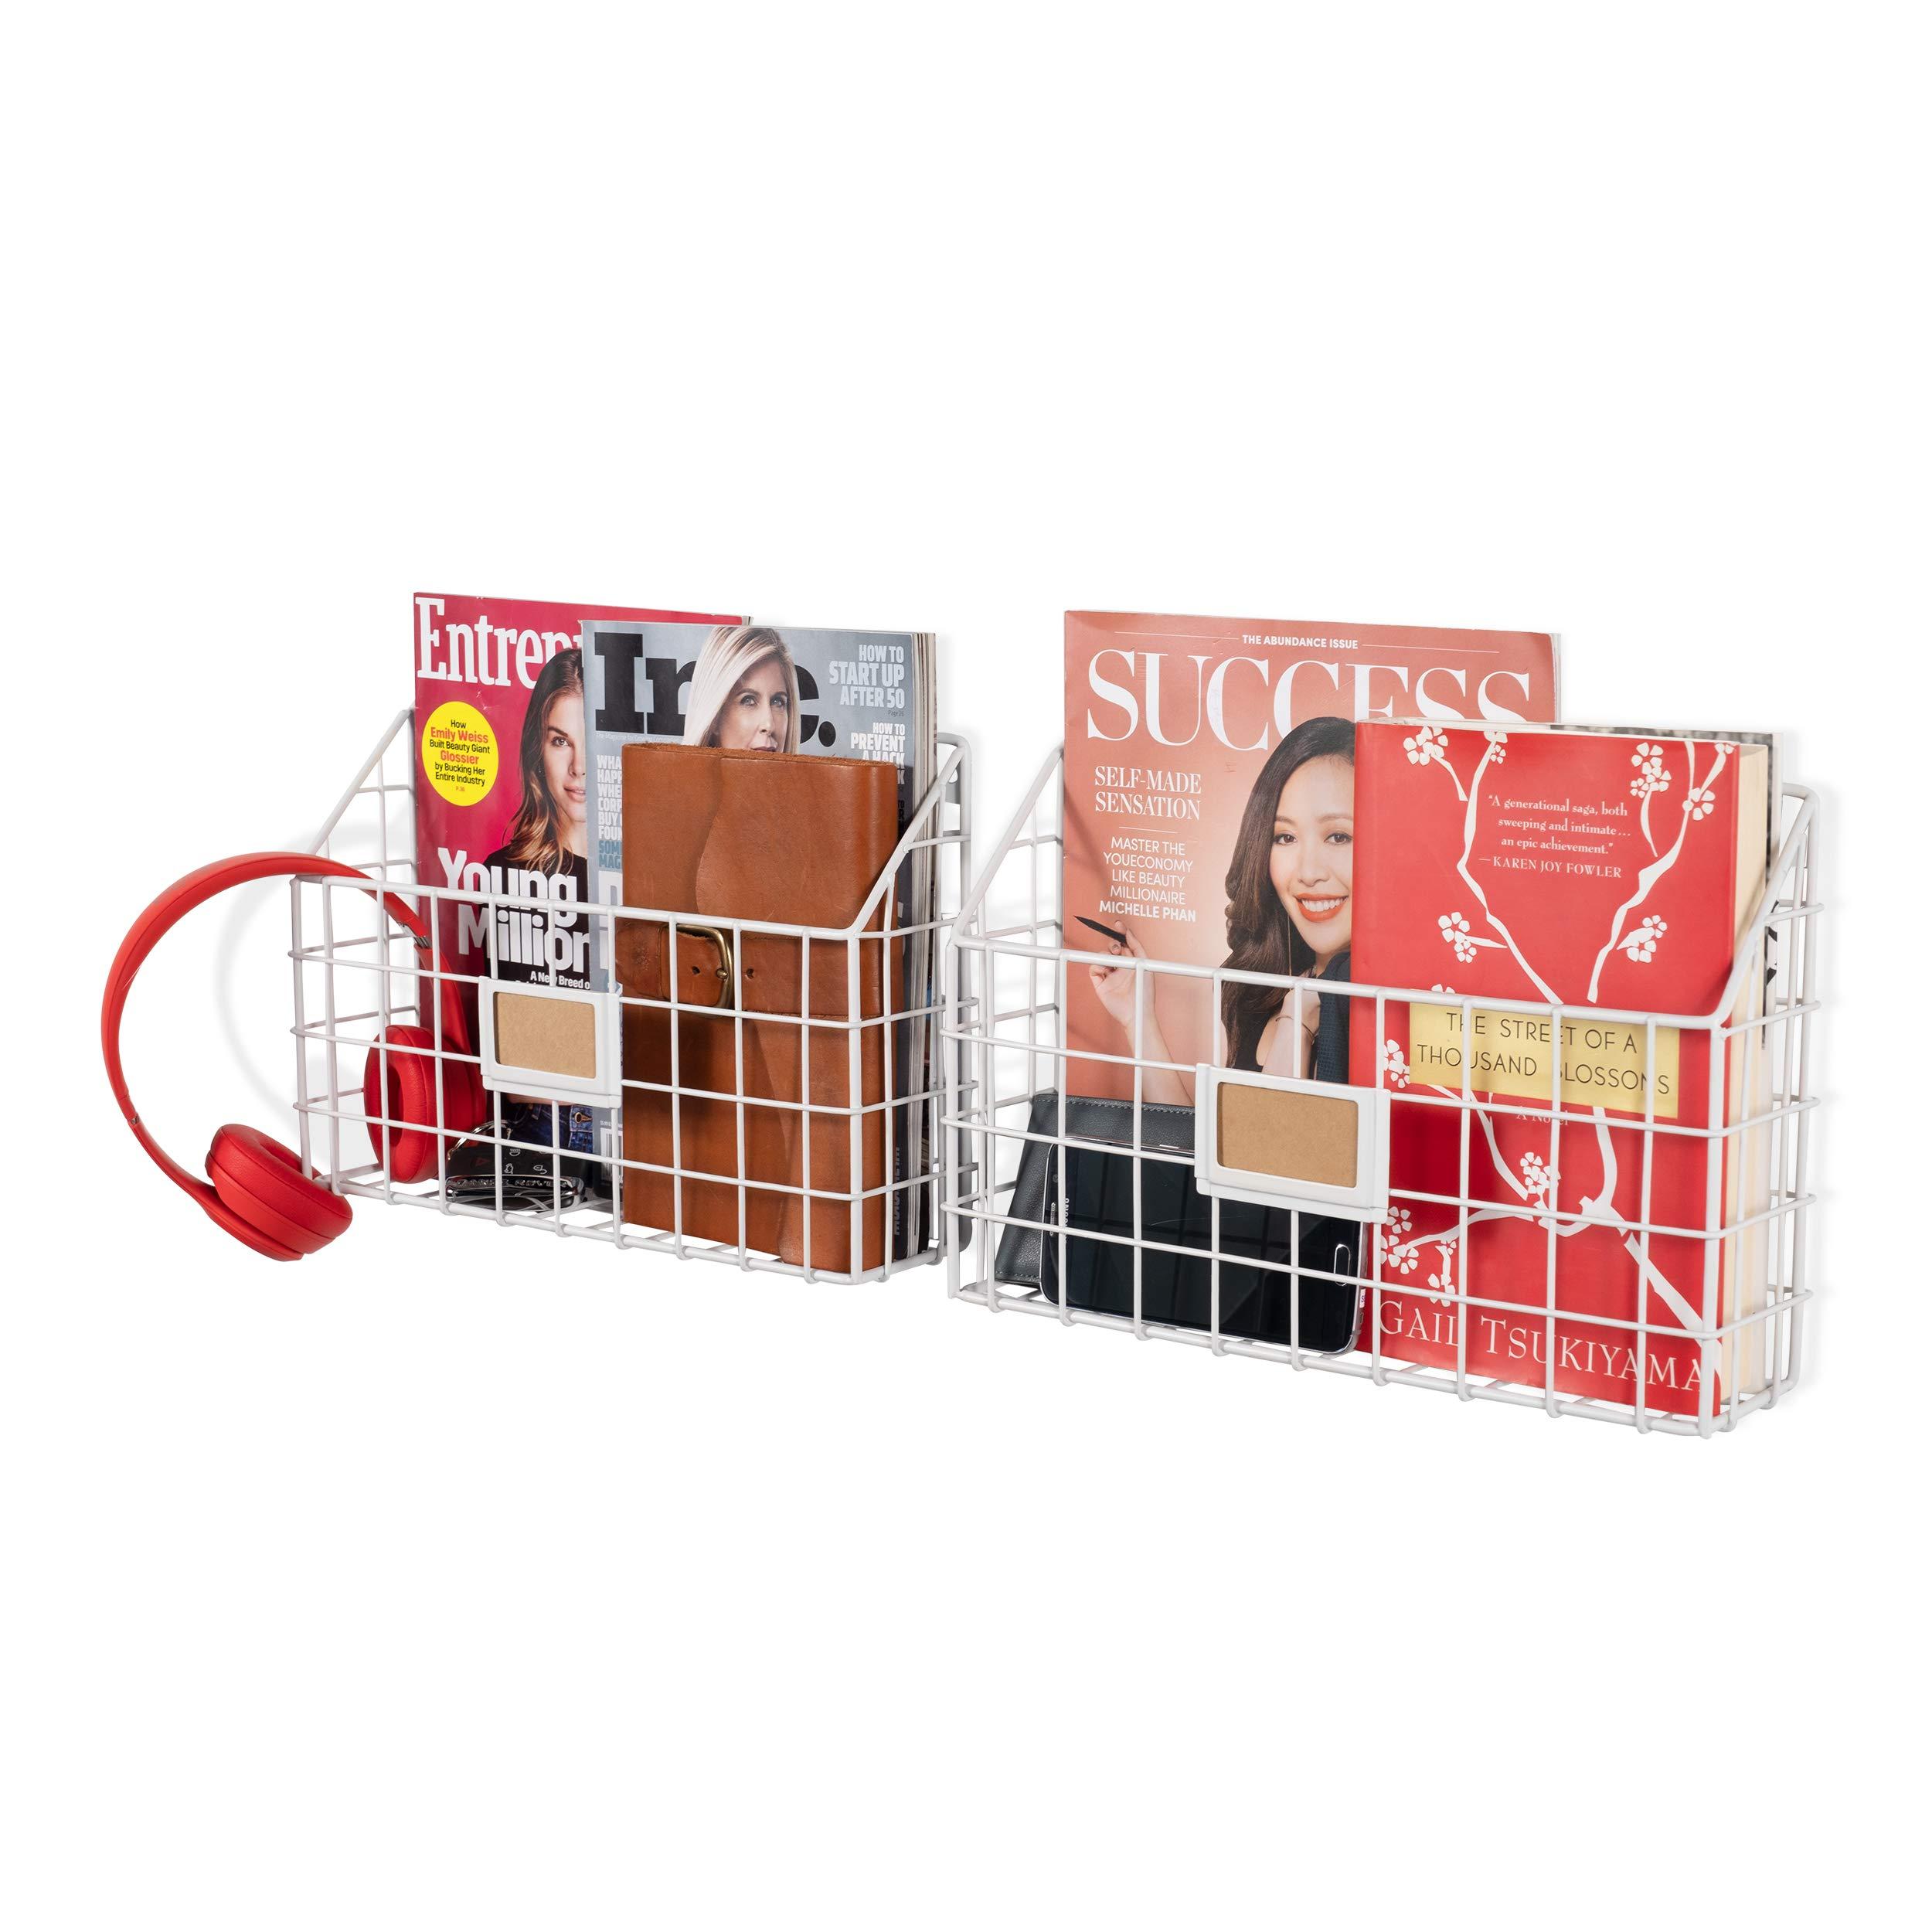 Wall35 Rivista Multipurpose Wall Mounted Farmhouse Design Basket - Wide Magazine Rack Metal Wire White Set of 2